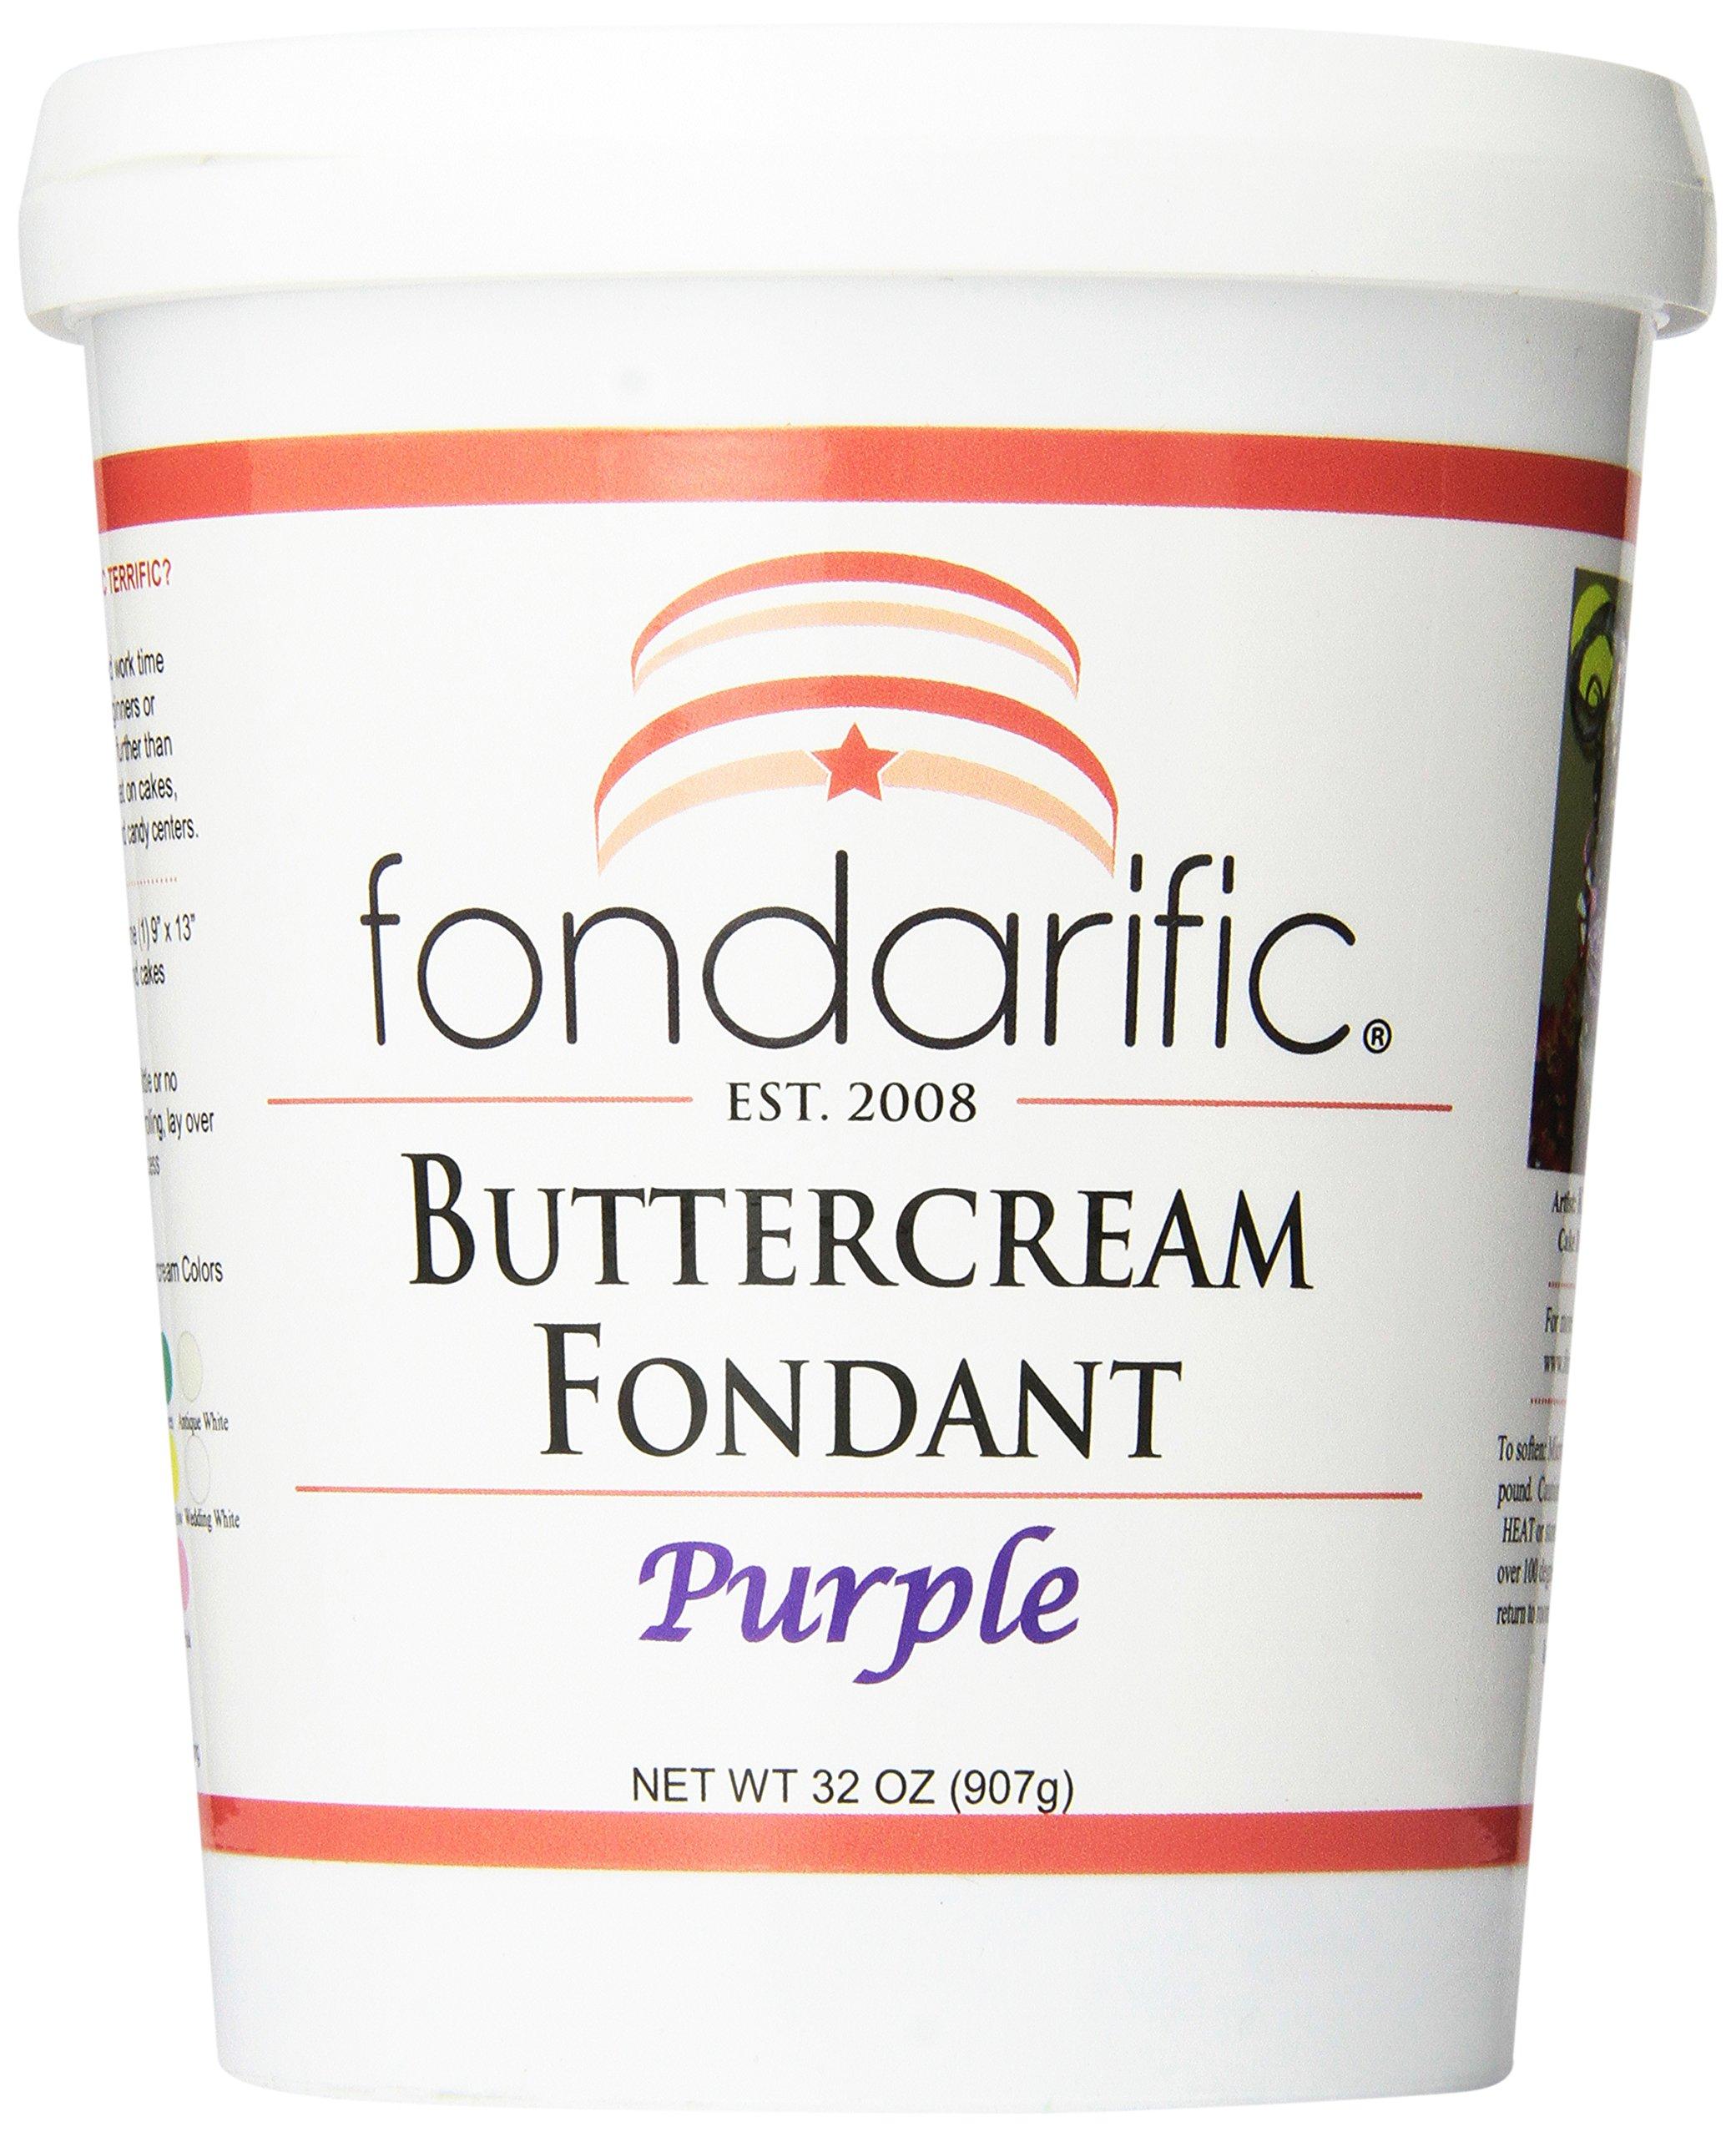 Fondarific Buttercream Purple Fondant, 32 oz by Fondarific